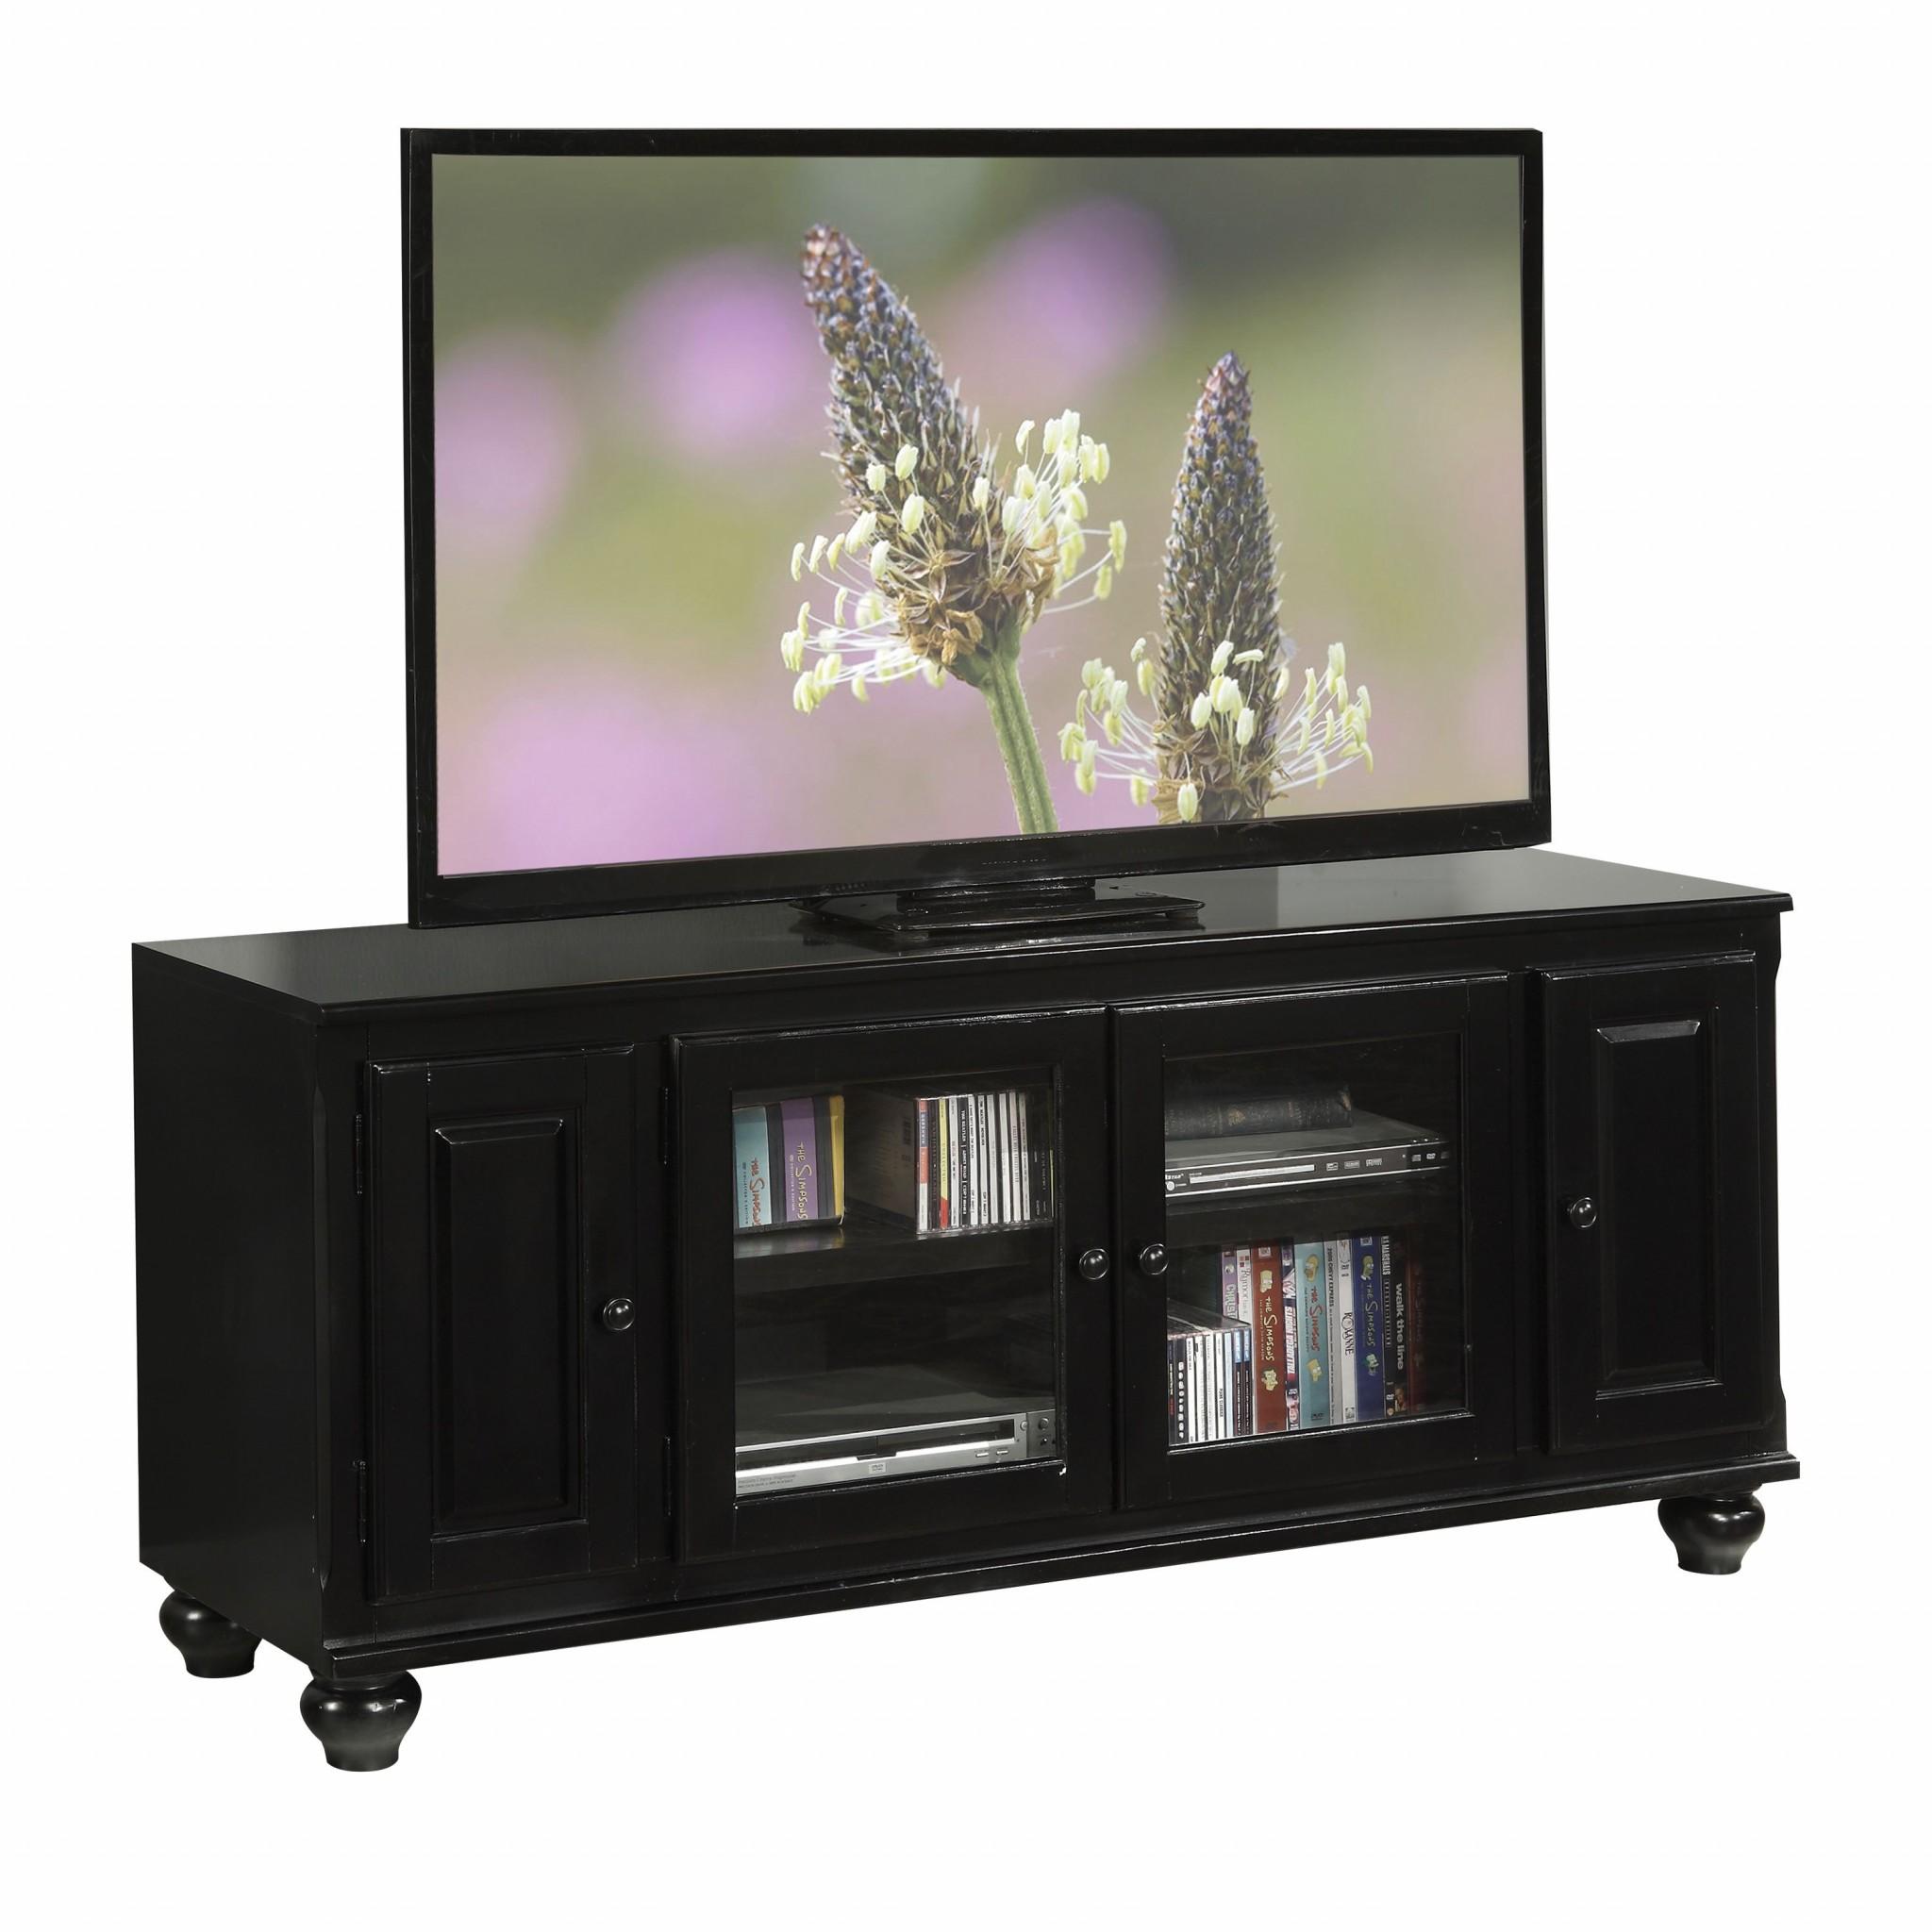 "19"" X 58"" X 26"" Black Wood Glass Veneer (Melamine) TV Stand"